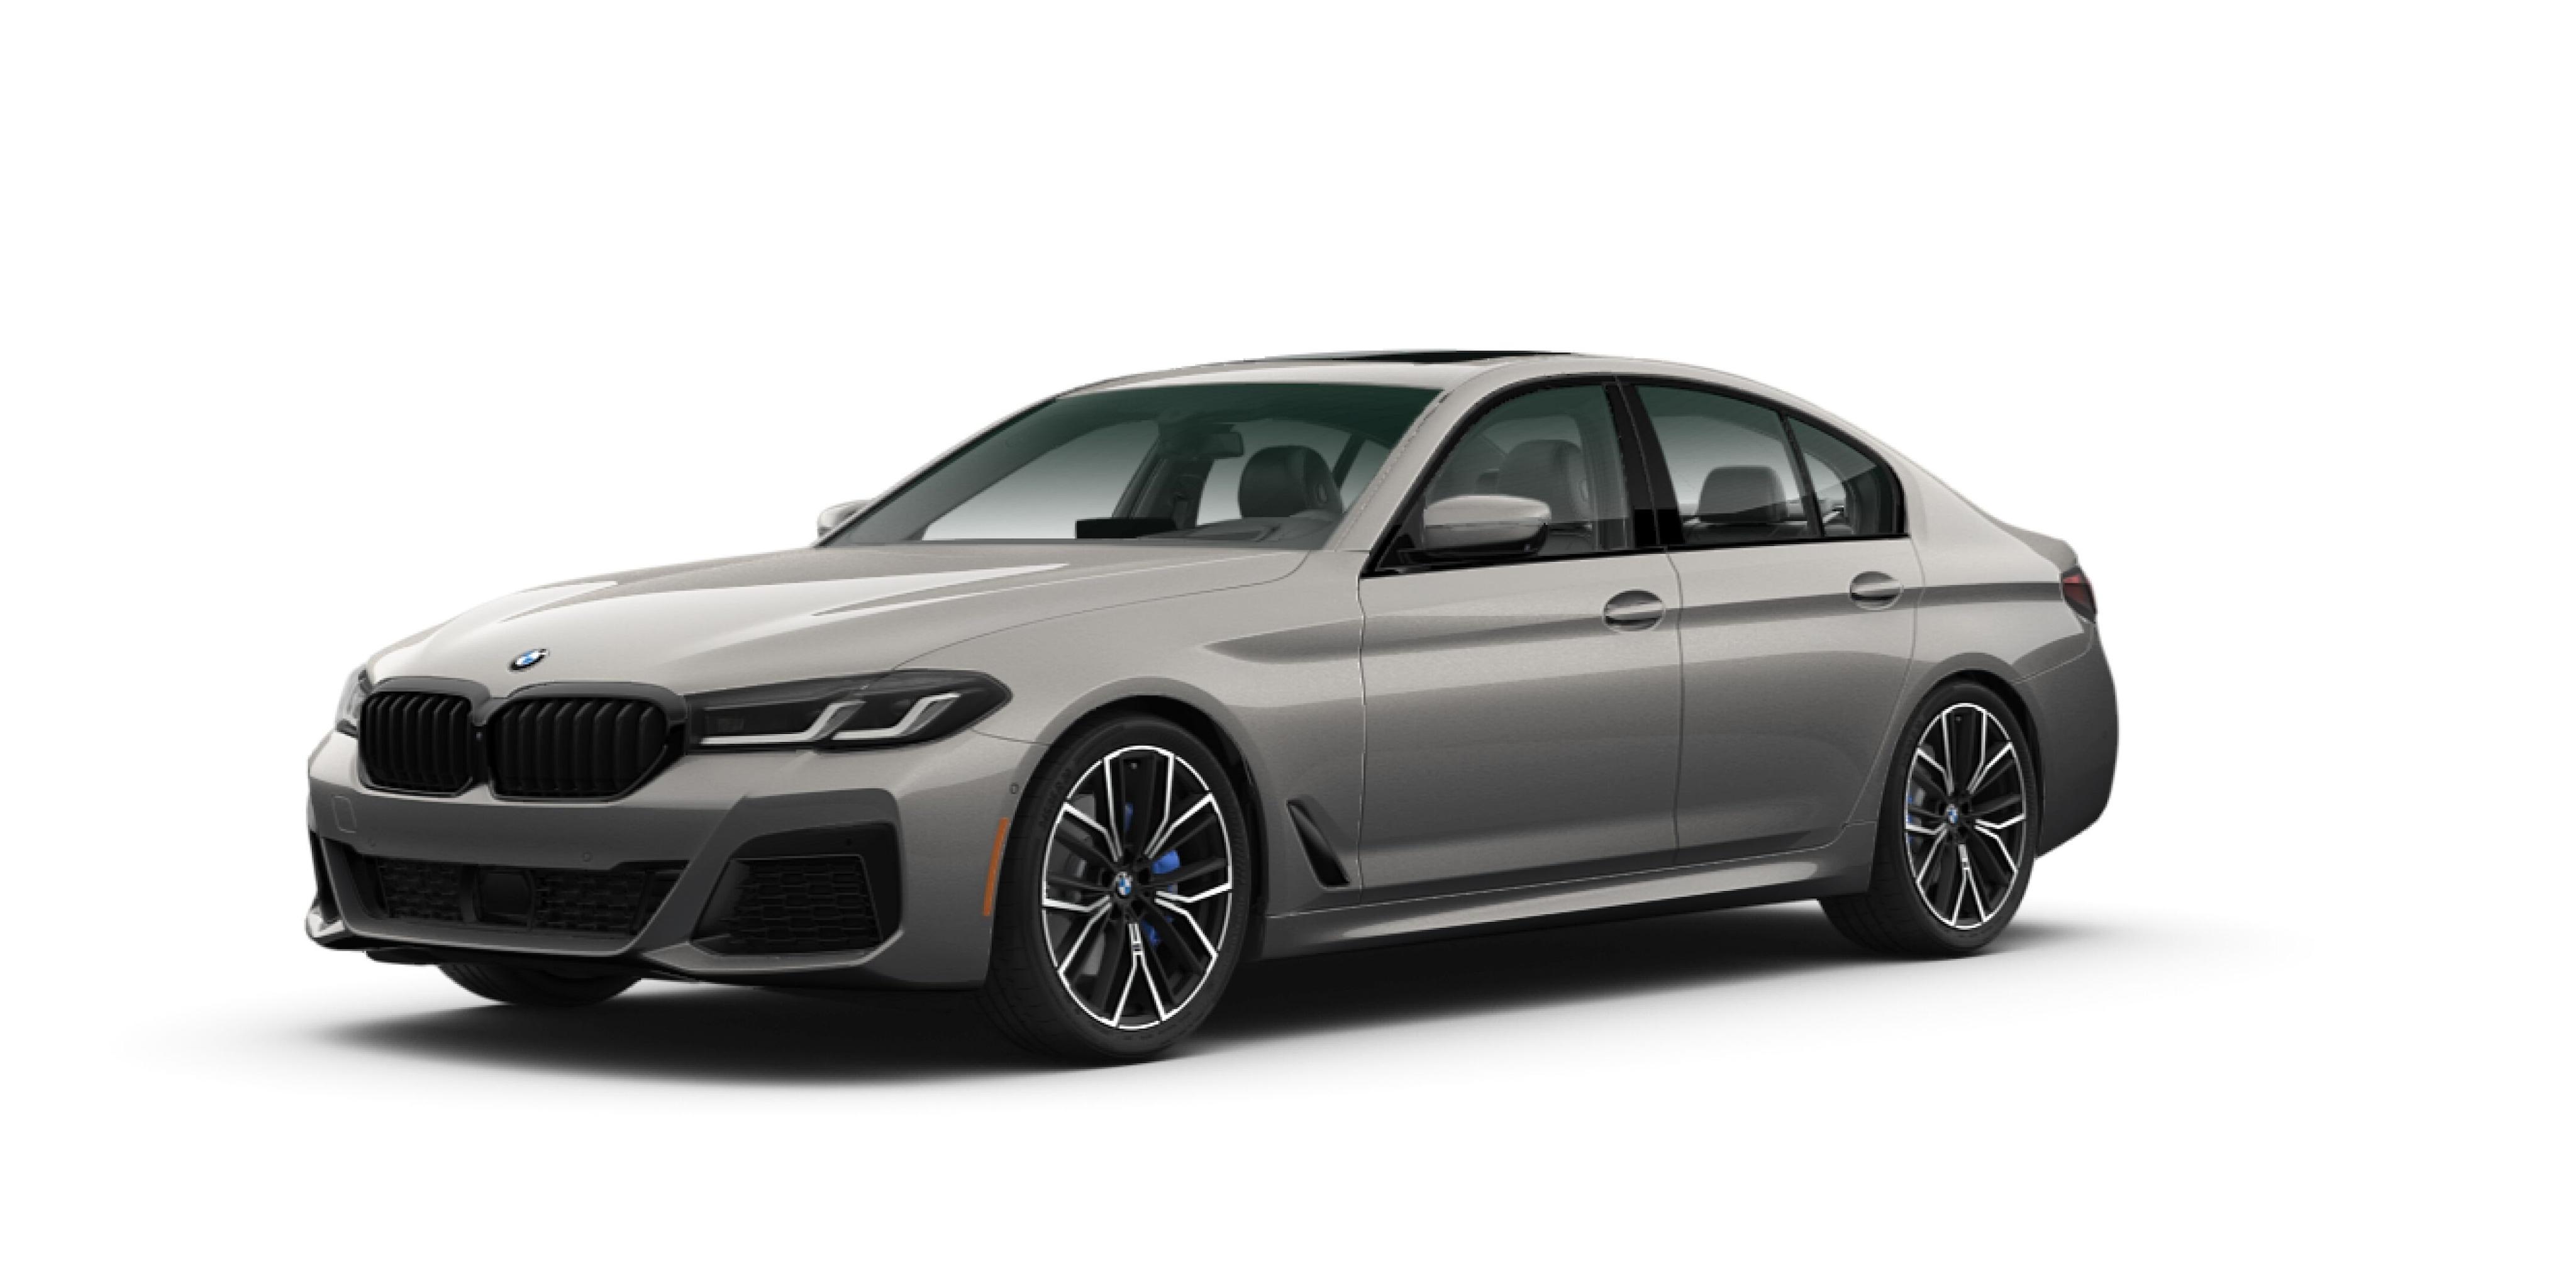 New 2021 BMW 540i For Sale in Atlanta GA | Stock: MWW89697